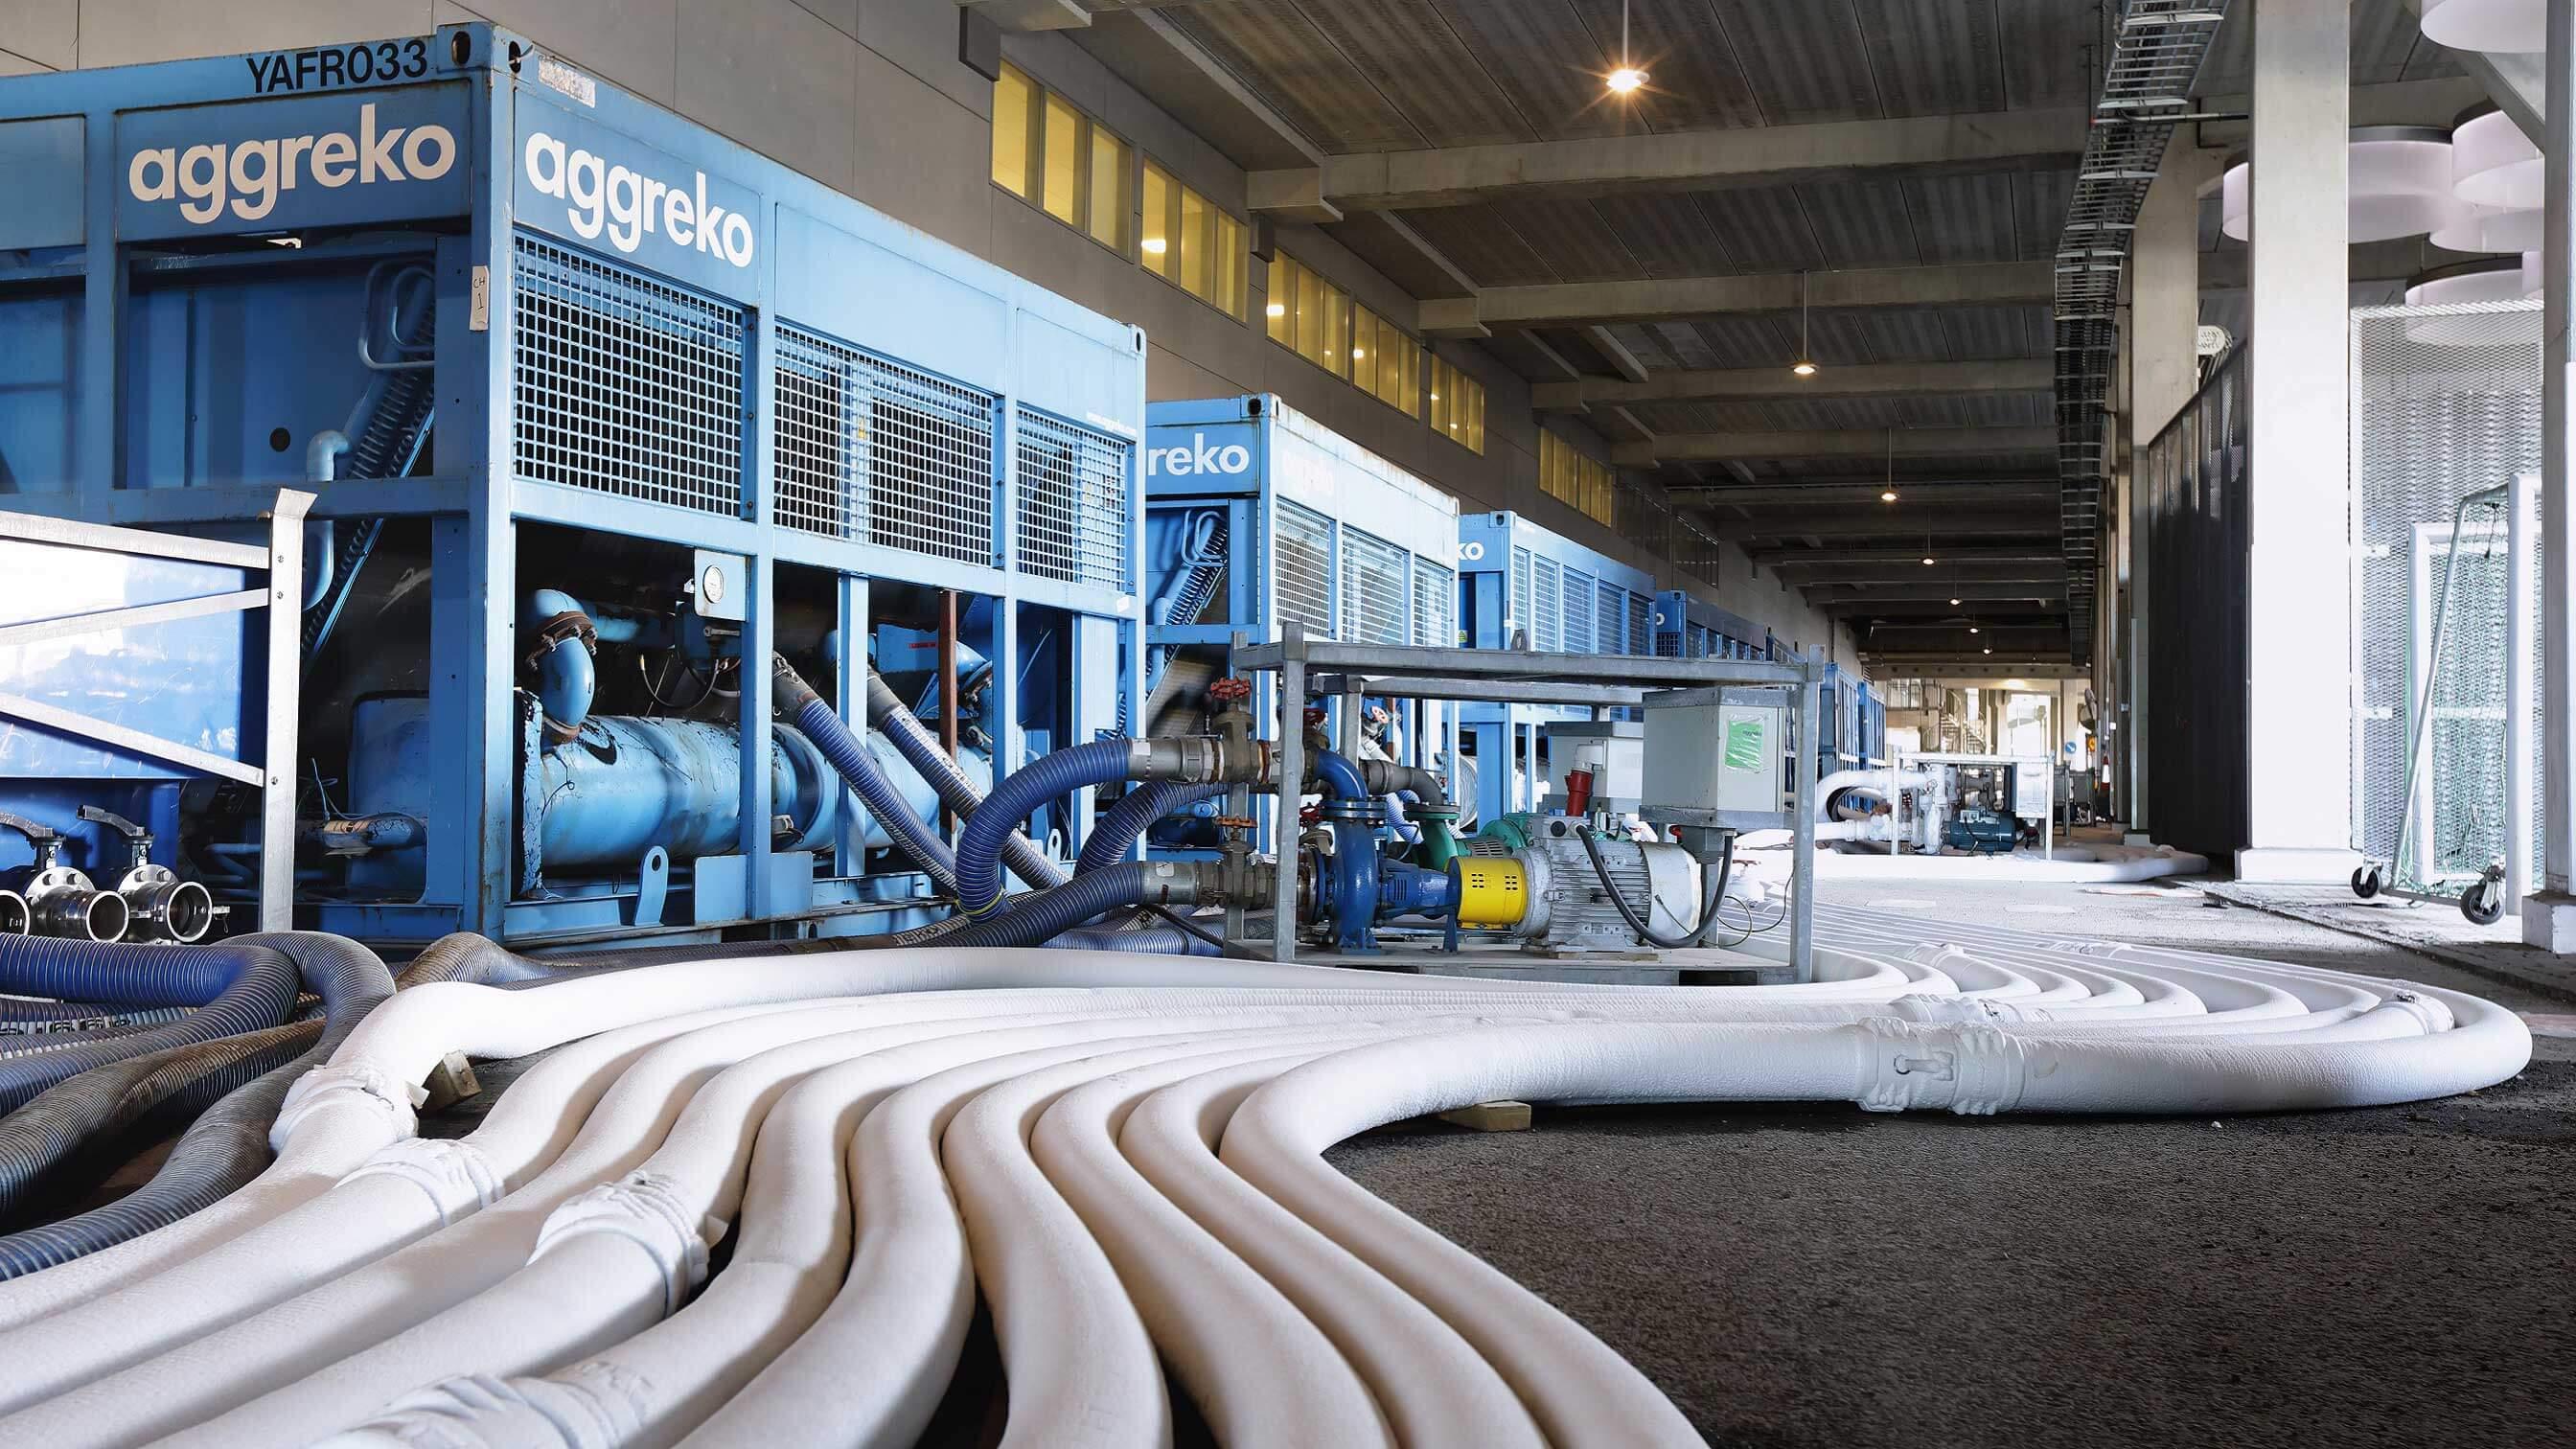 Industrial Cooling Equipment Hire Aggreko